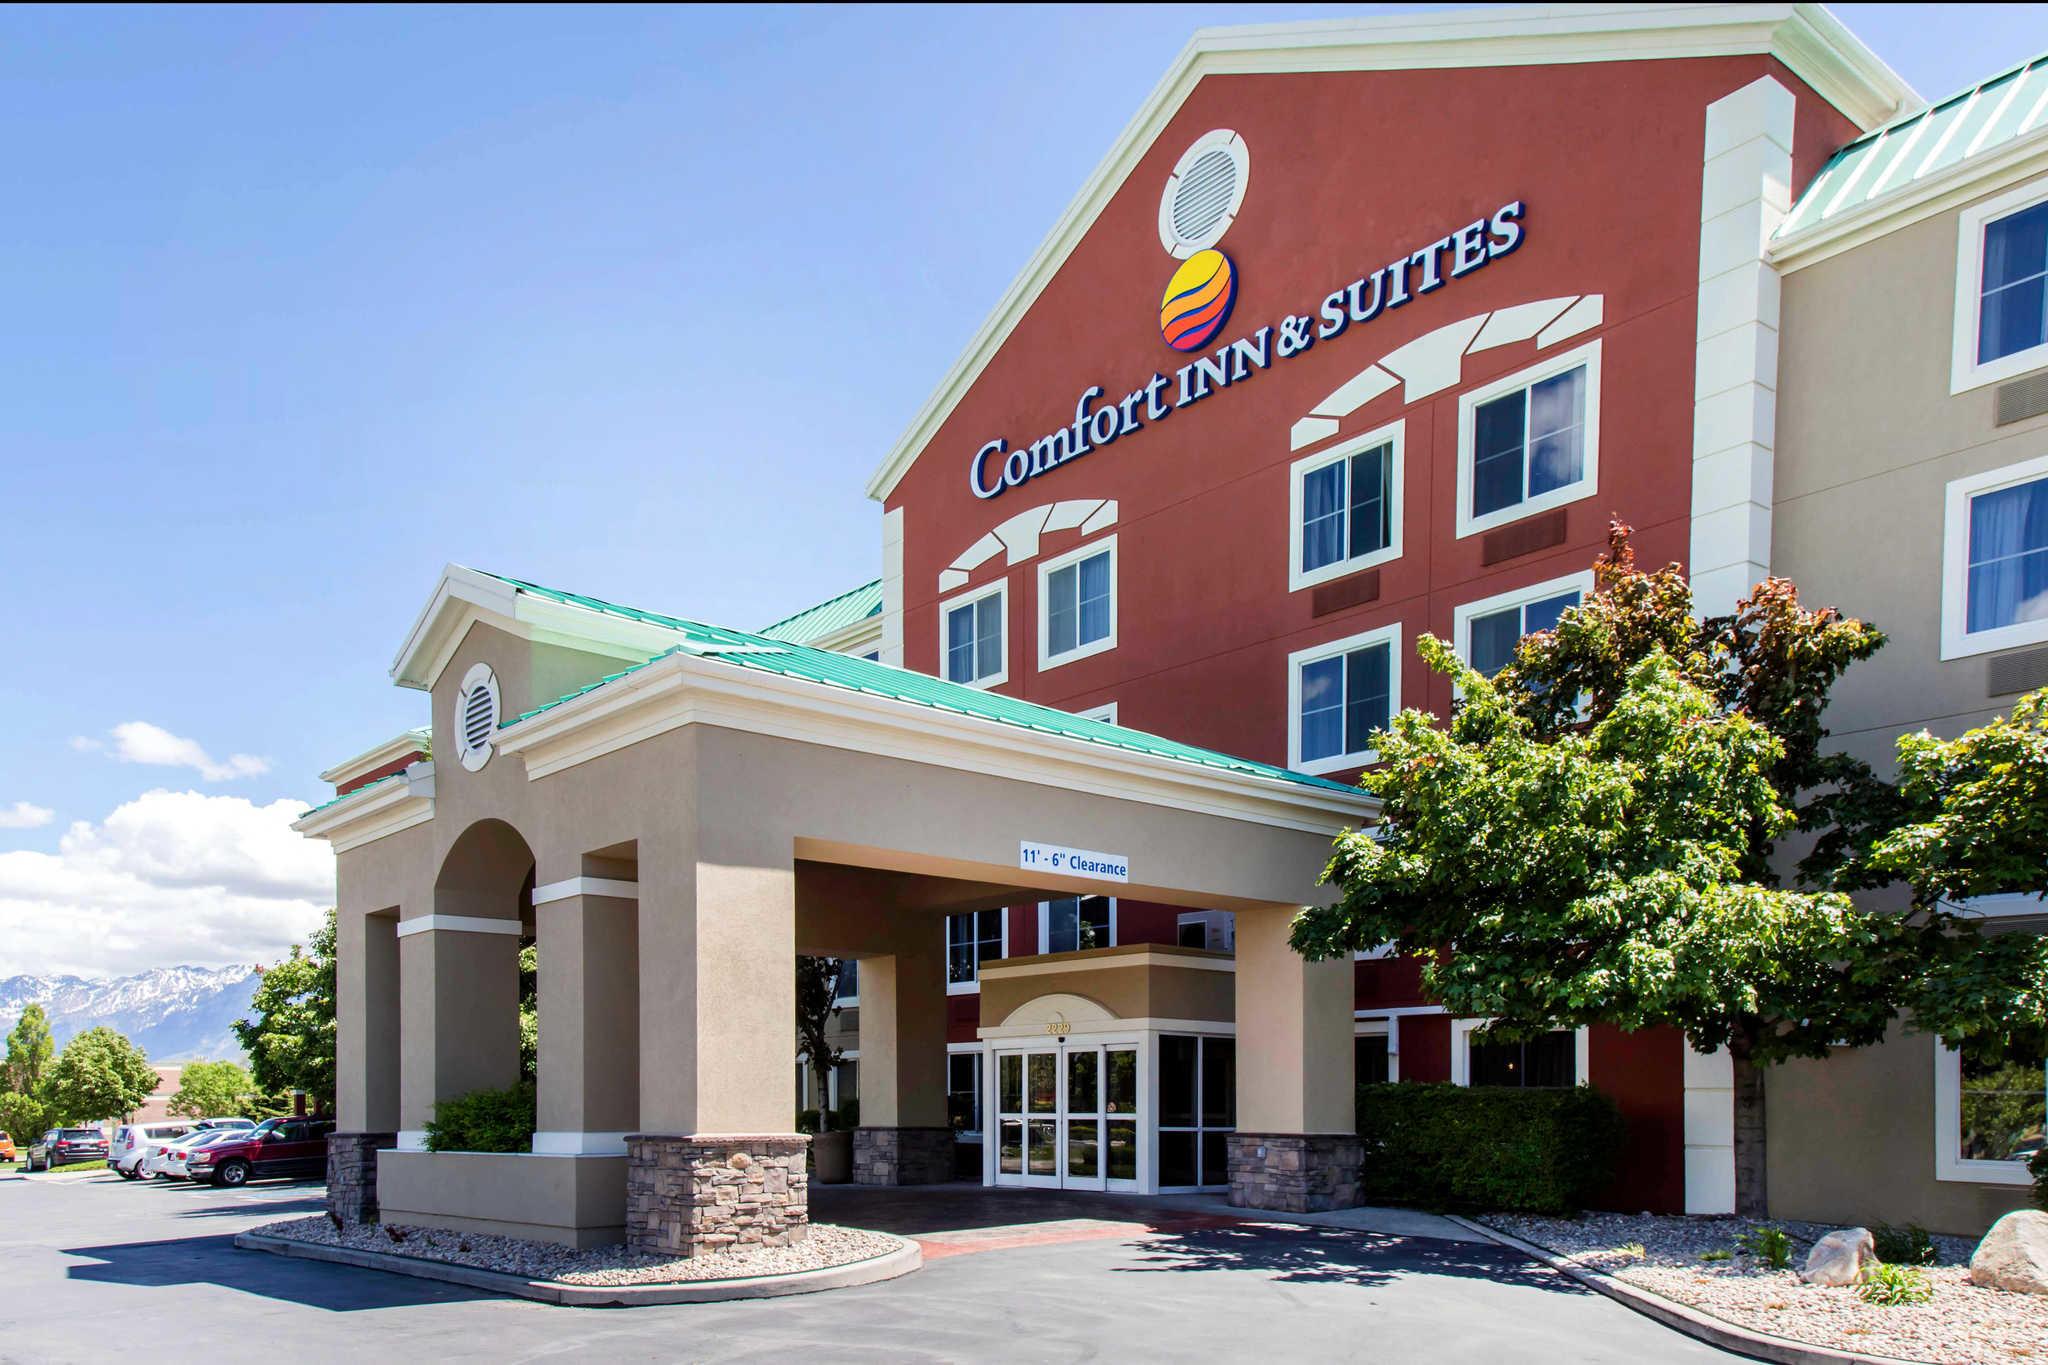 Comfort Inn West Valley - Salt Lake City South   2229 W. City Center Court, West Valley City, UT, 84119   +1 (801) 886-1300